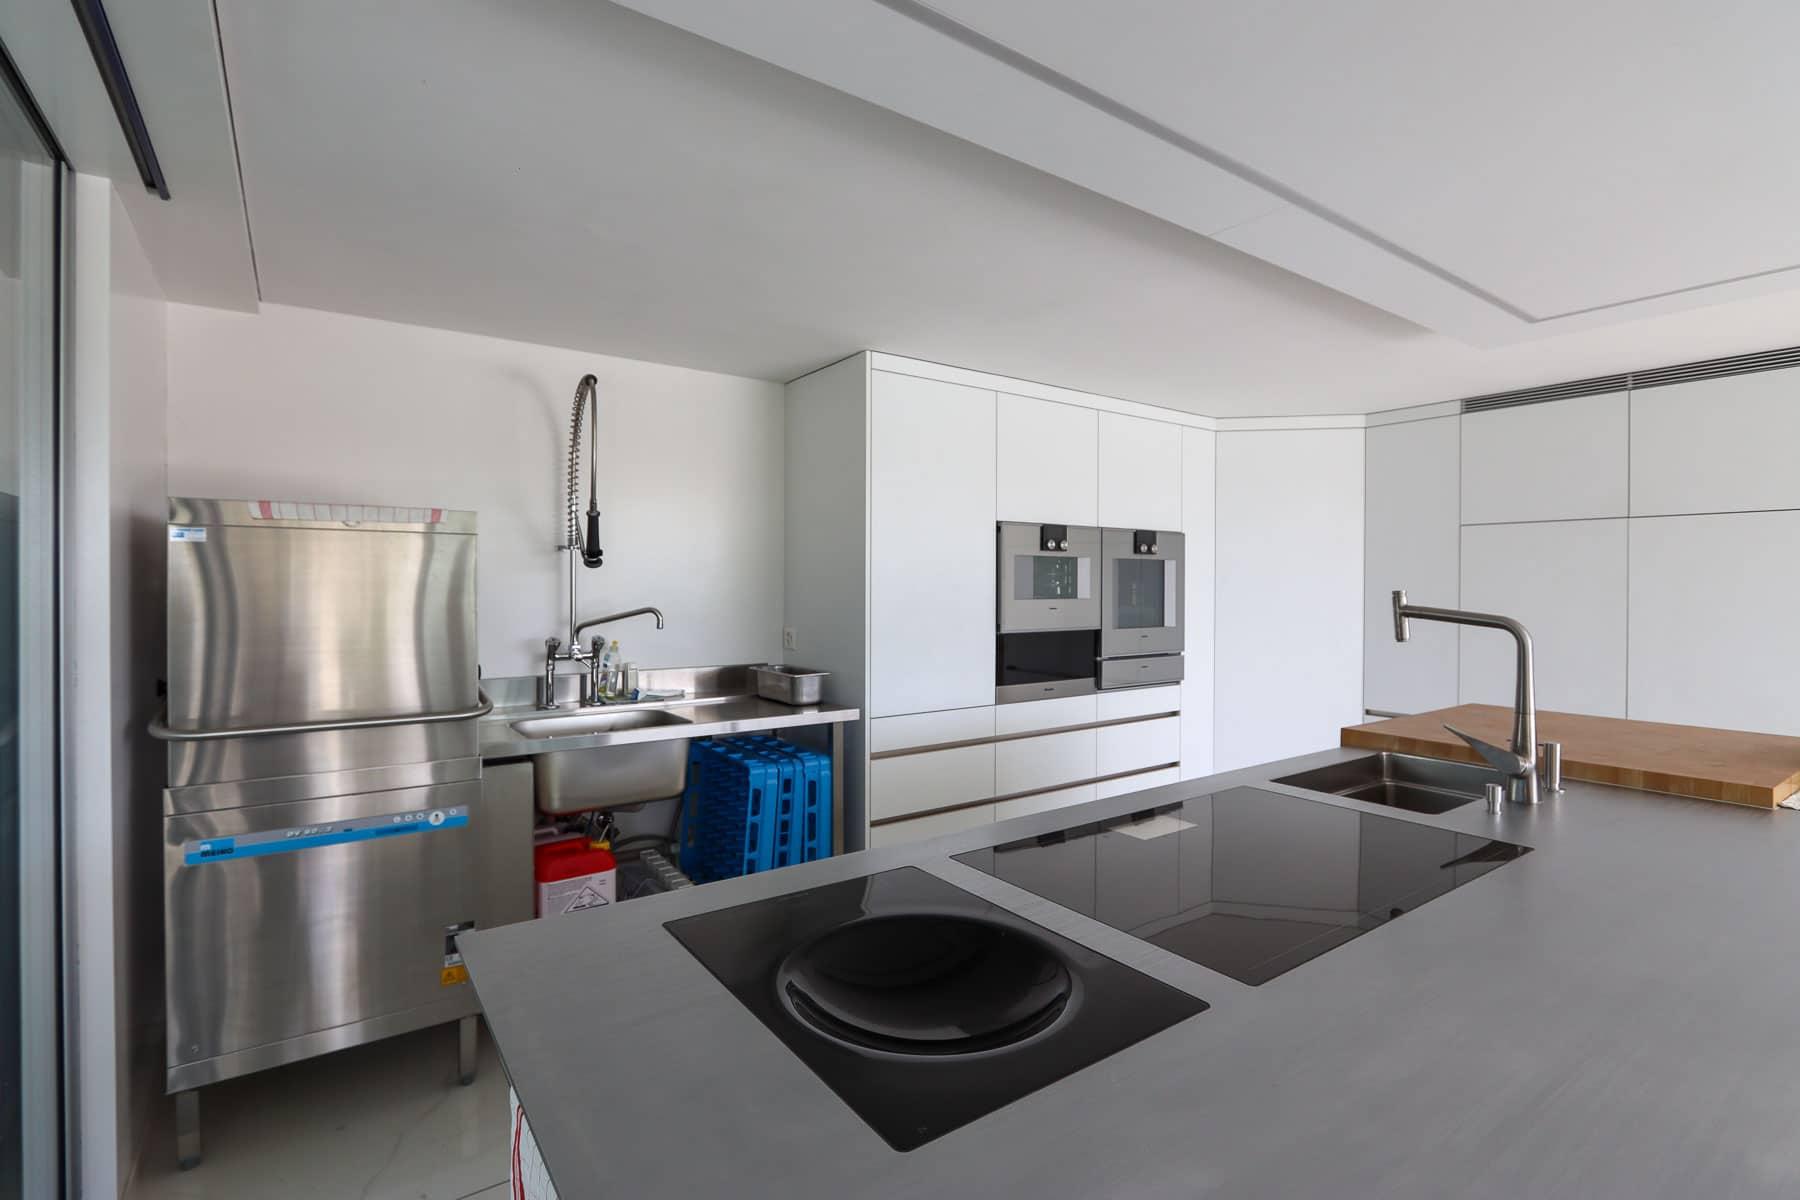 10-Küche-bearbeitet